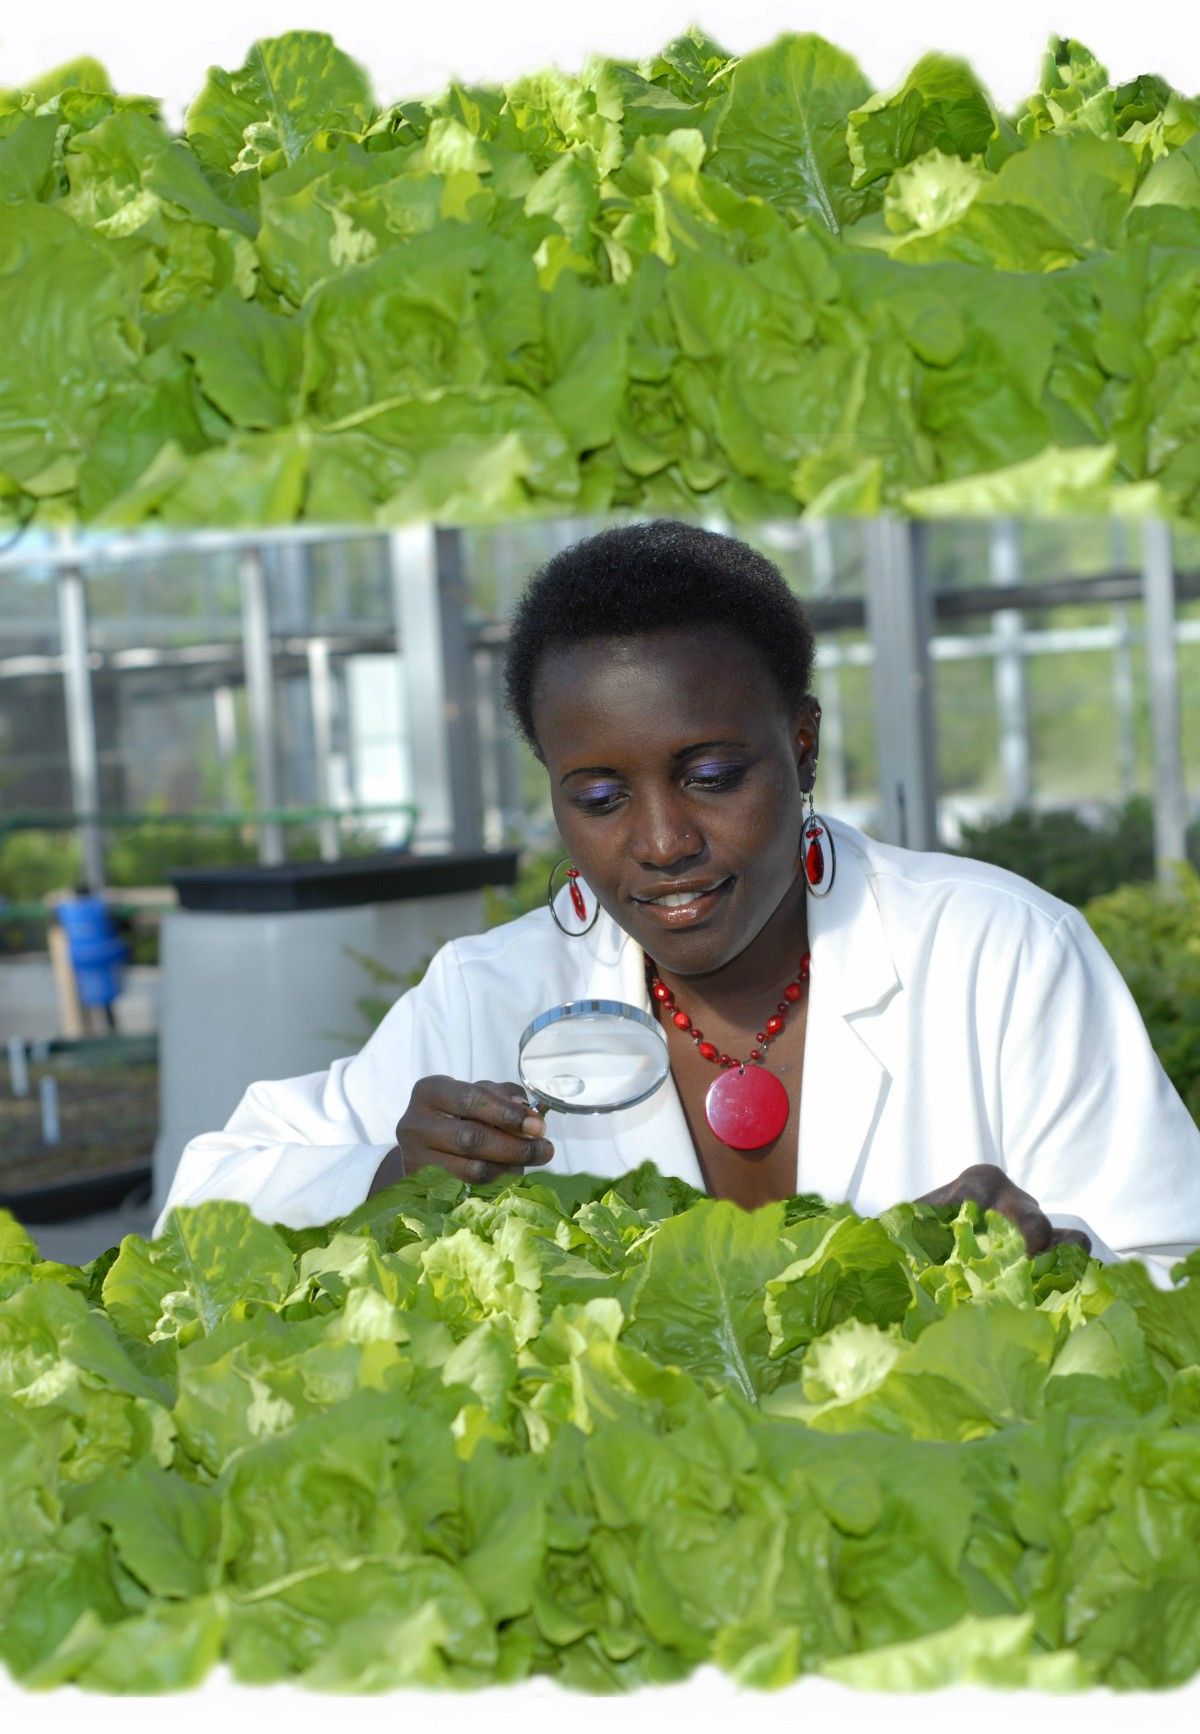 Esther Ngumbi at Auburn University Plant Science Research Center (picture taken by Laryssa Ferrara).